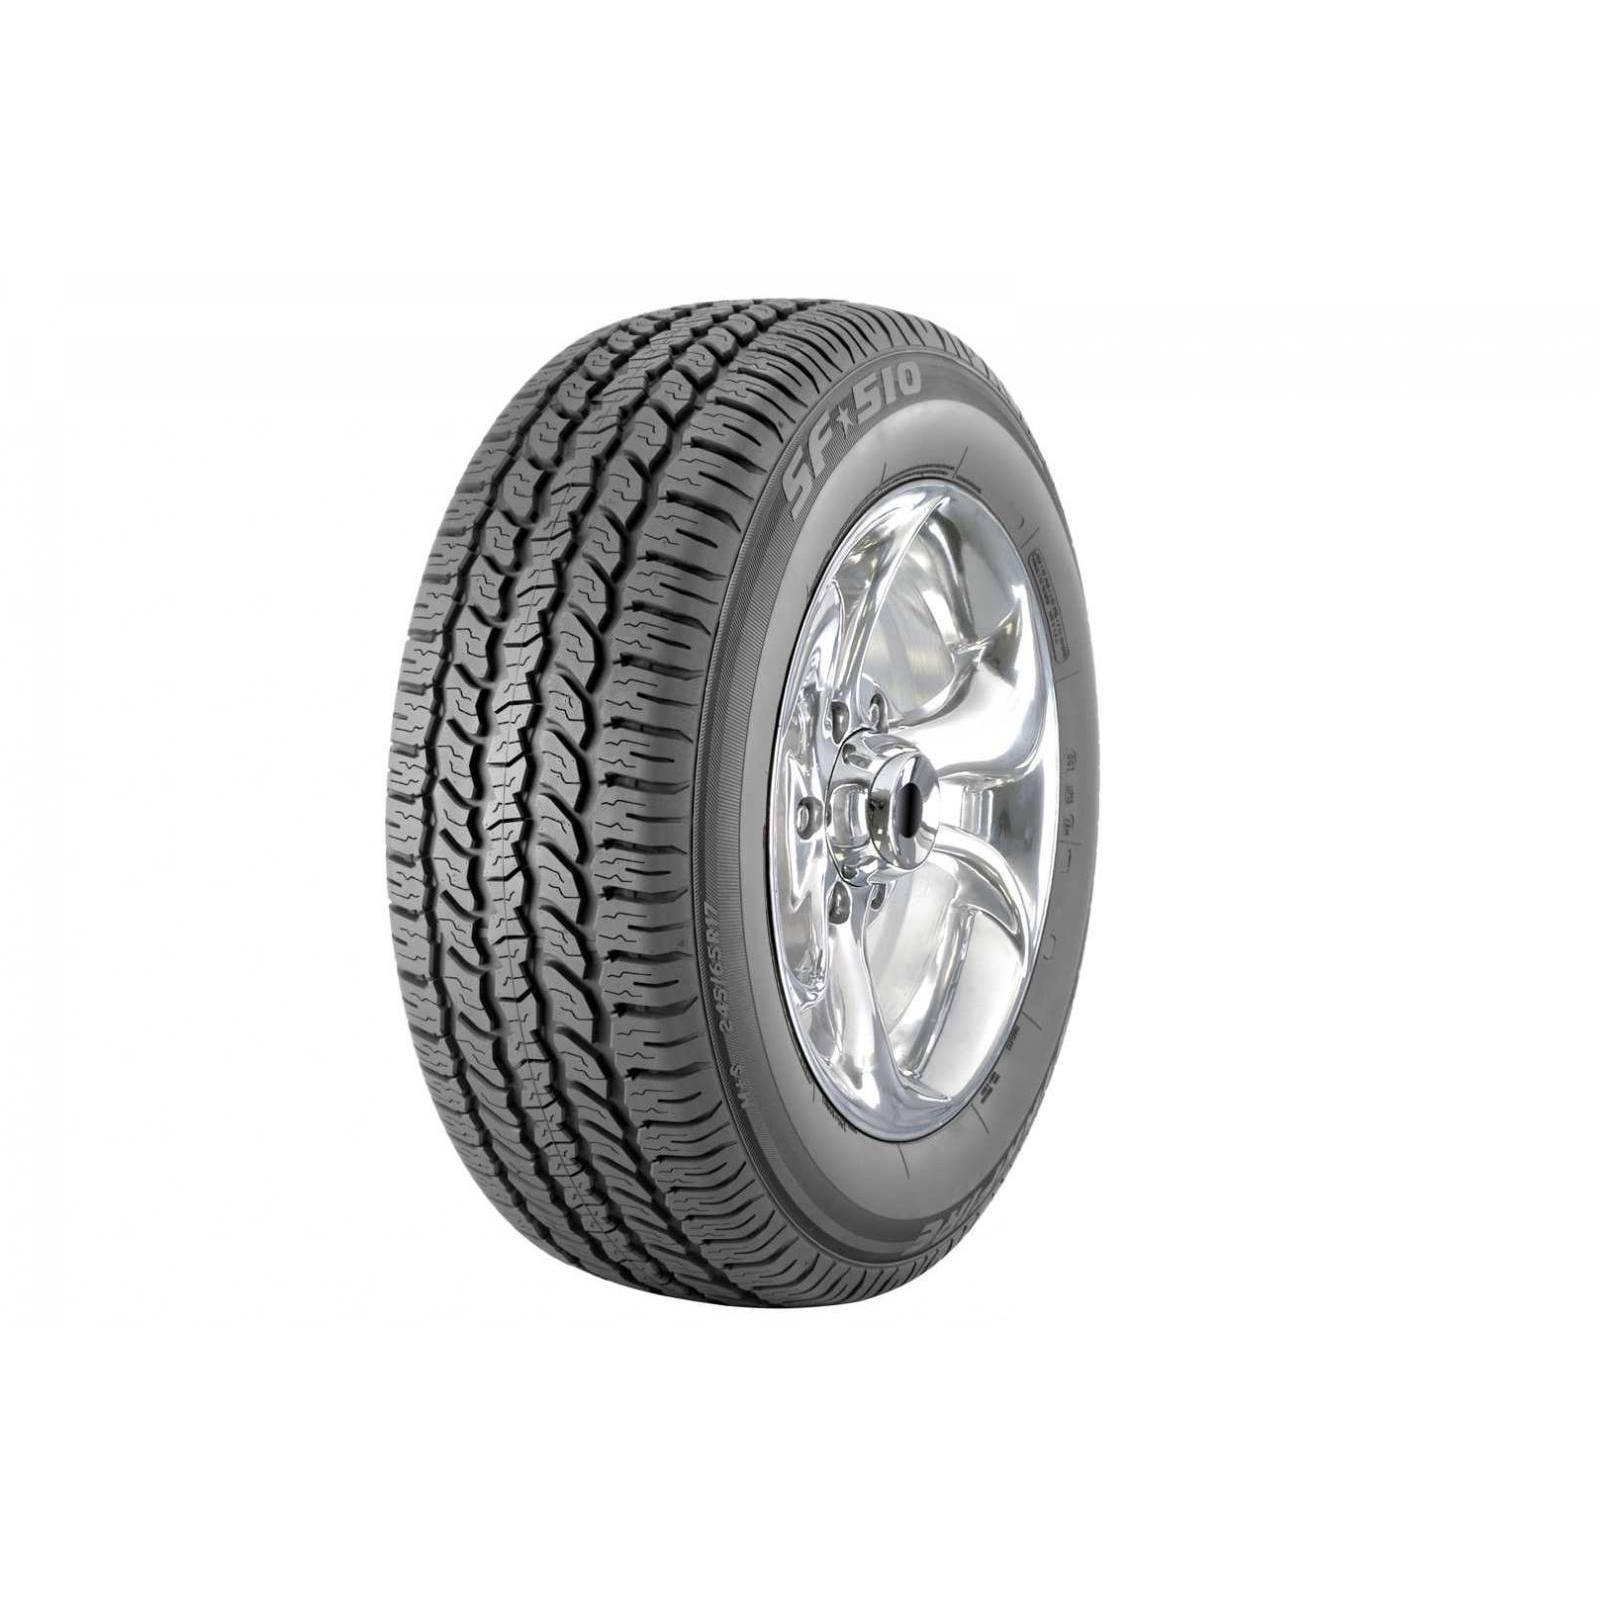 Starfire SF-510 LT All Season Tire - LT225/75R16 LRE/10 p...